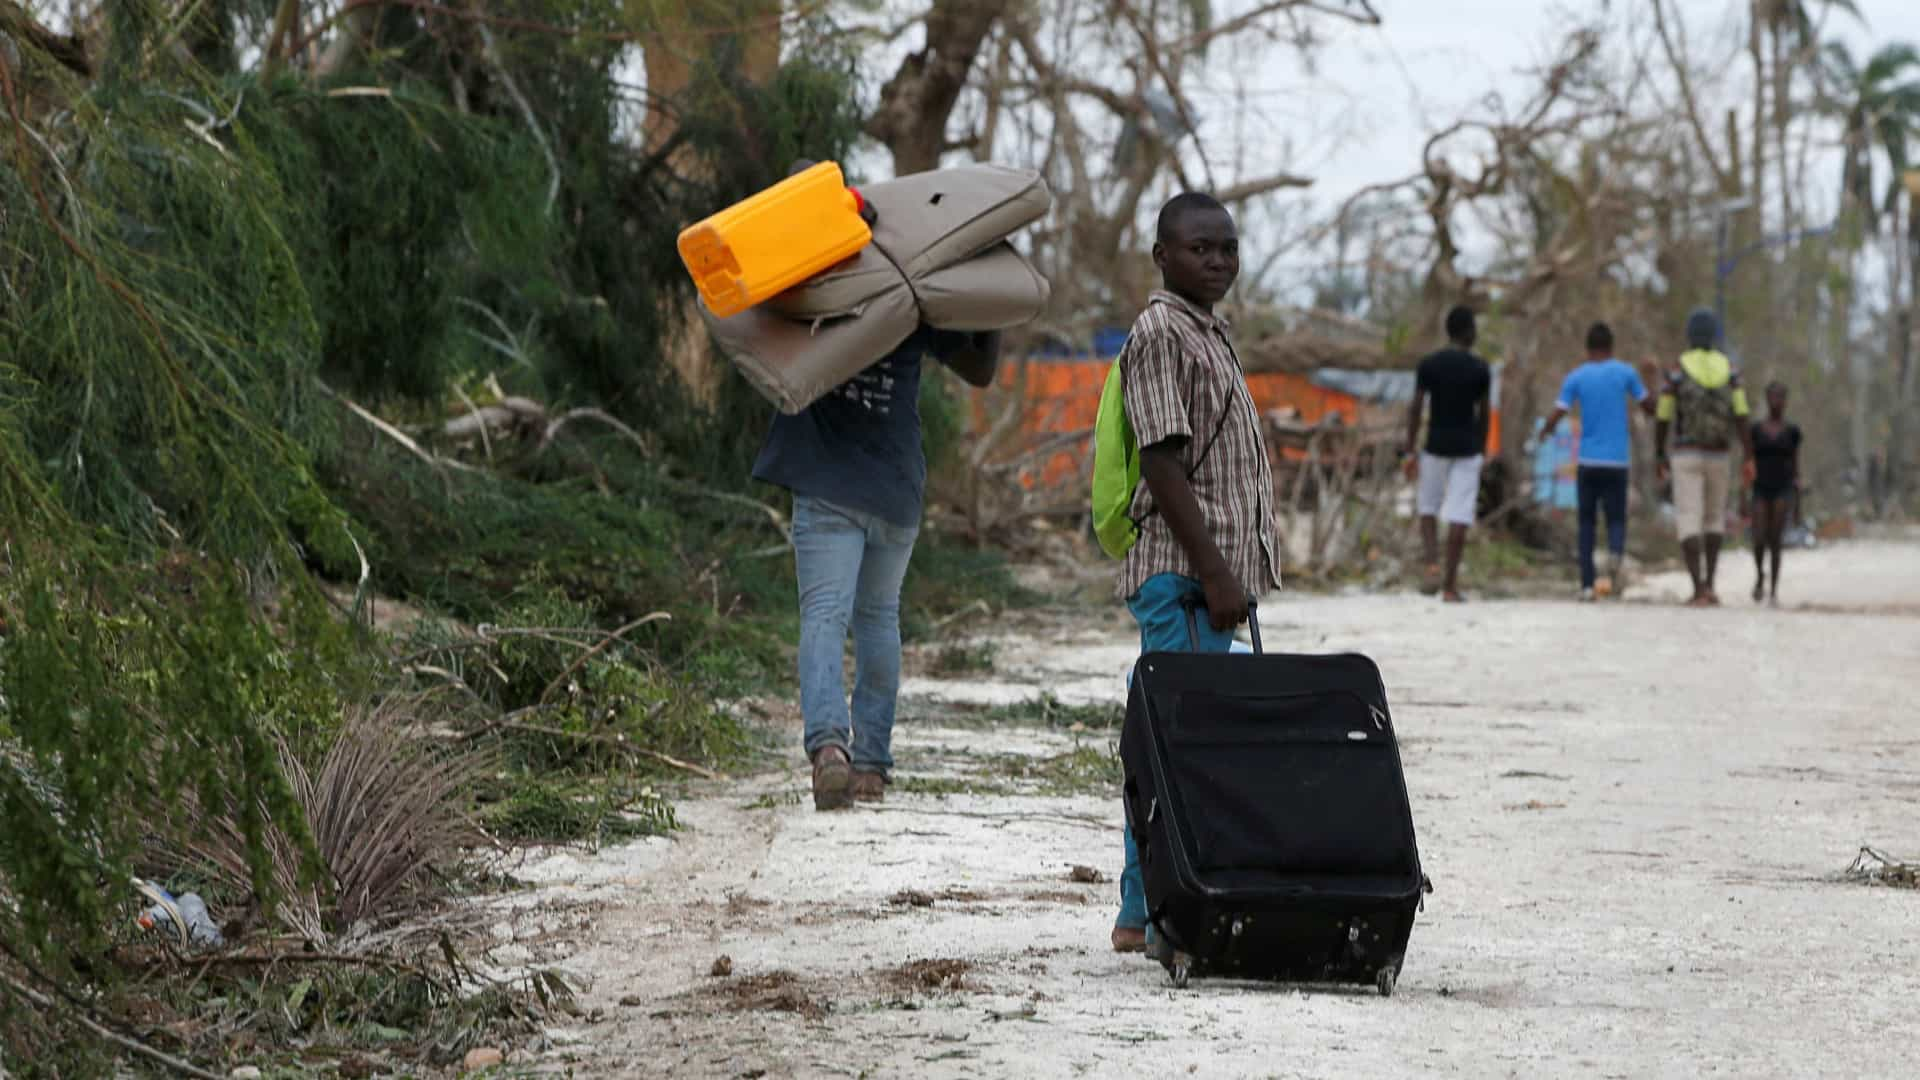 Campanha carioca vai enviar alimentos para as vítimas do Haiti